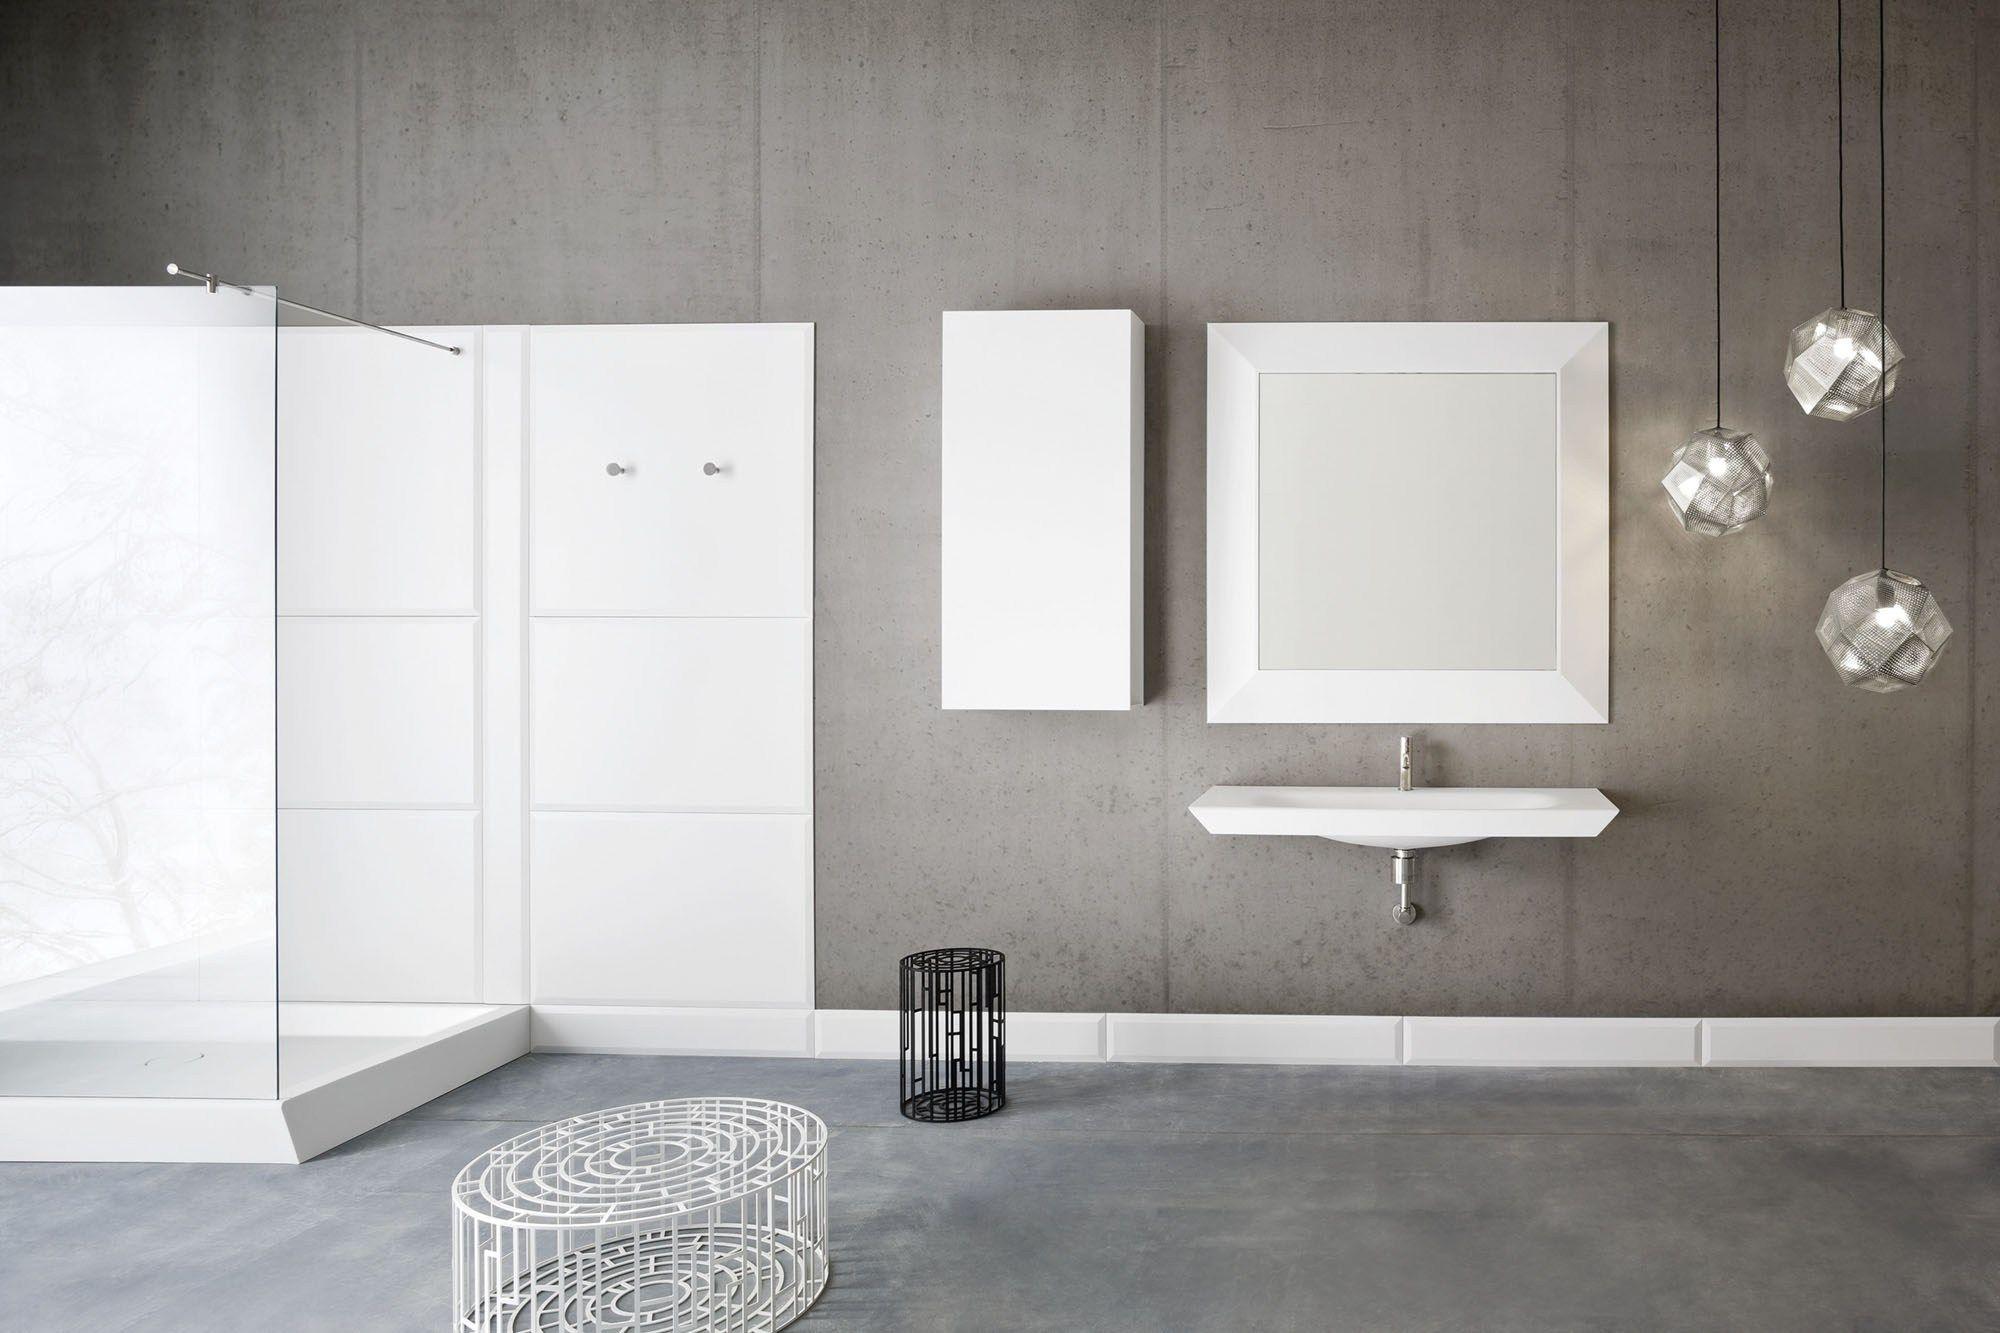 Warp | Wall Cabinet By Rexa Design Design Carlo Dal Bianco, Badezimmer Ideen